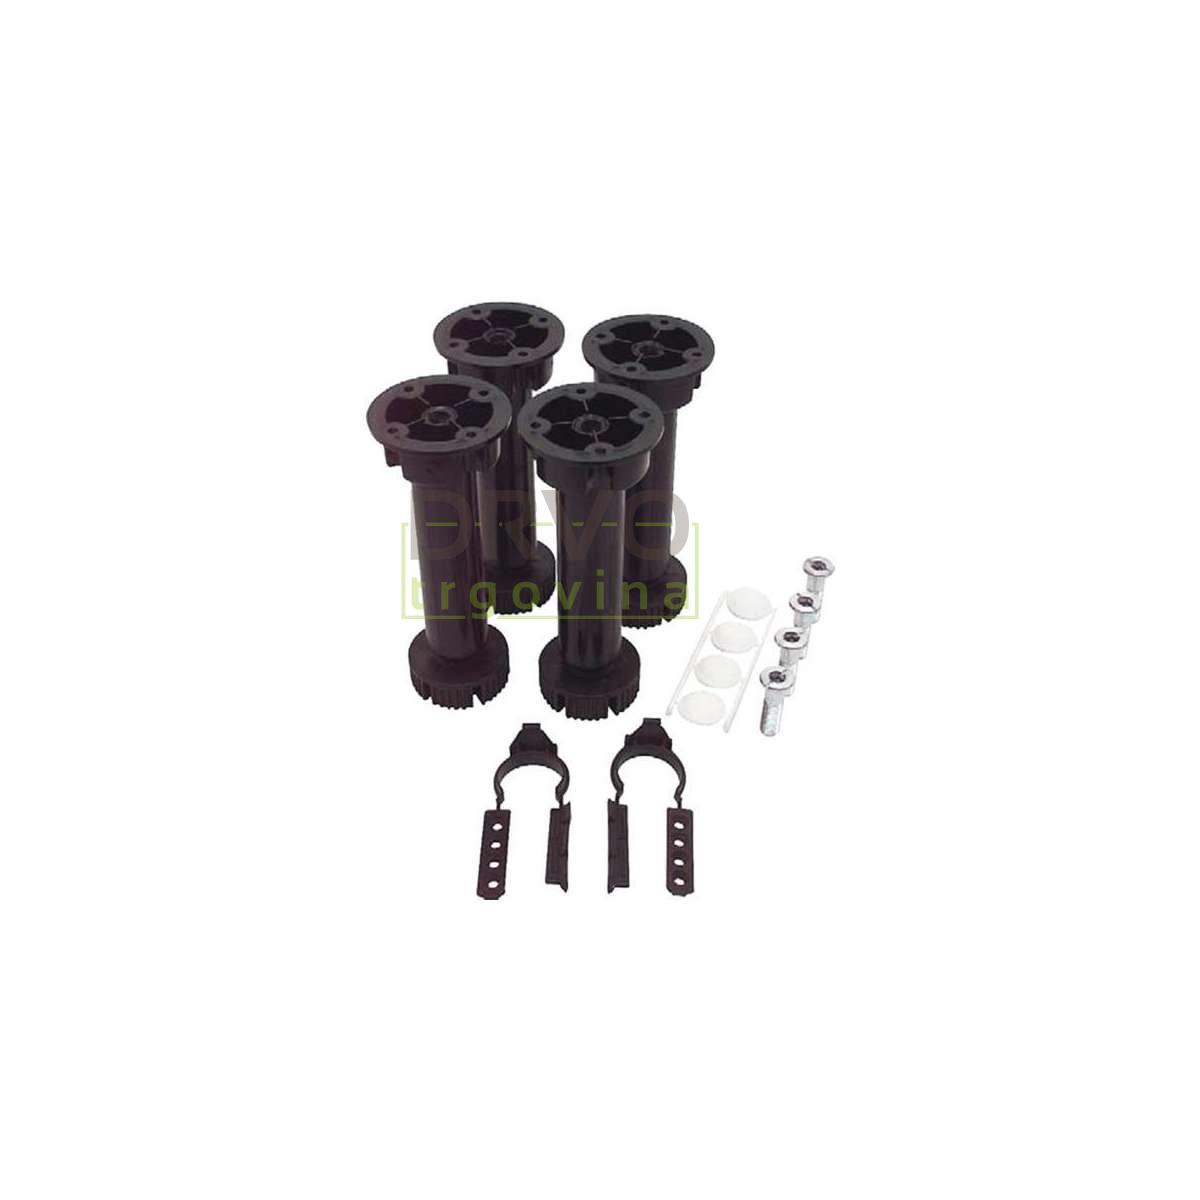 NOGA 150mm PVC 4/1 103337276 S